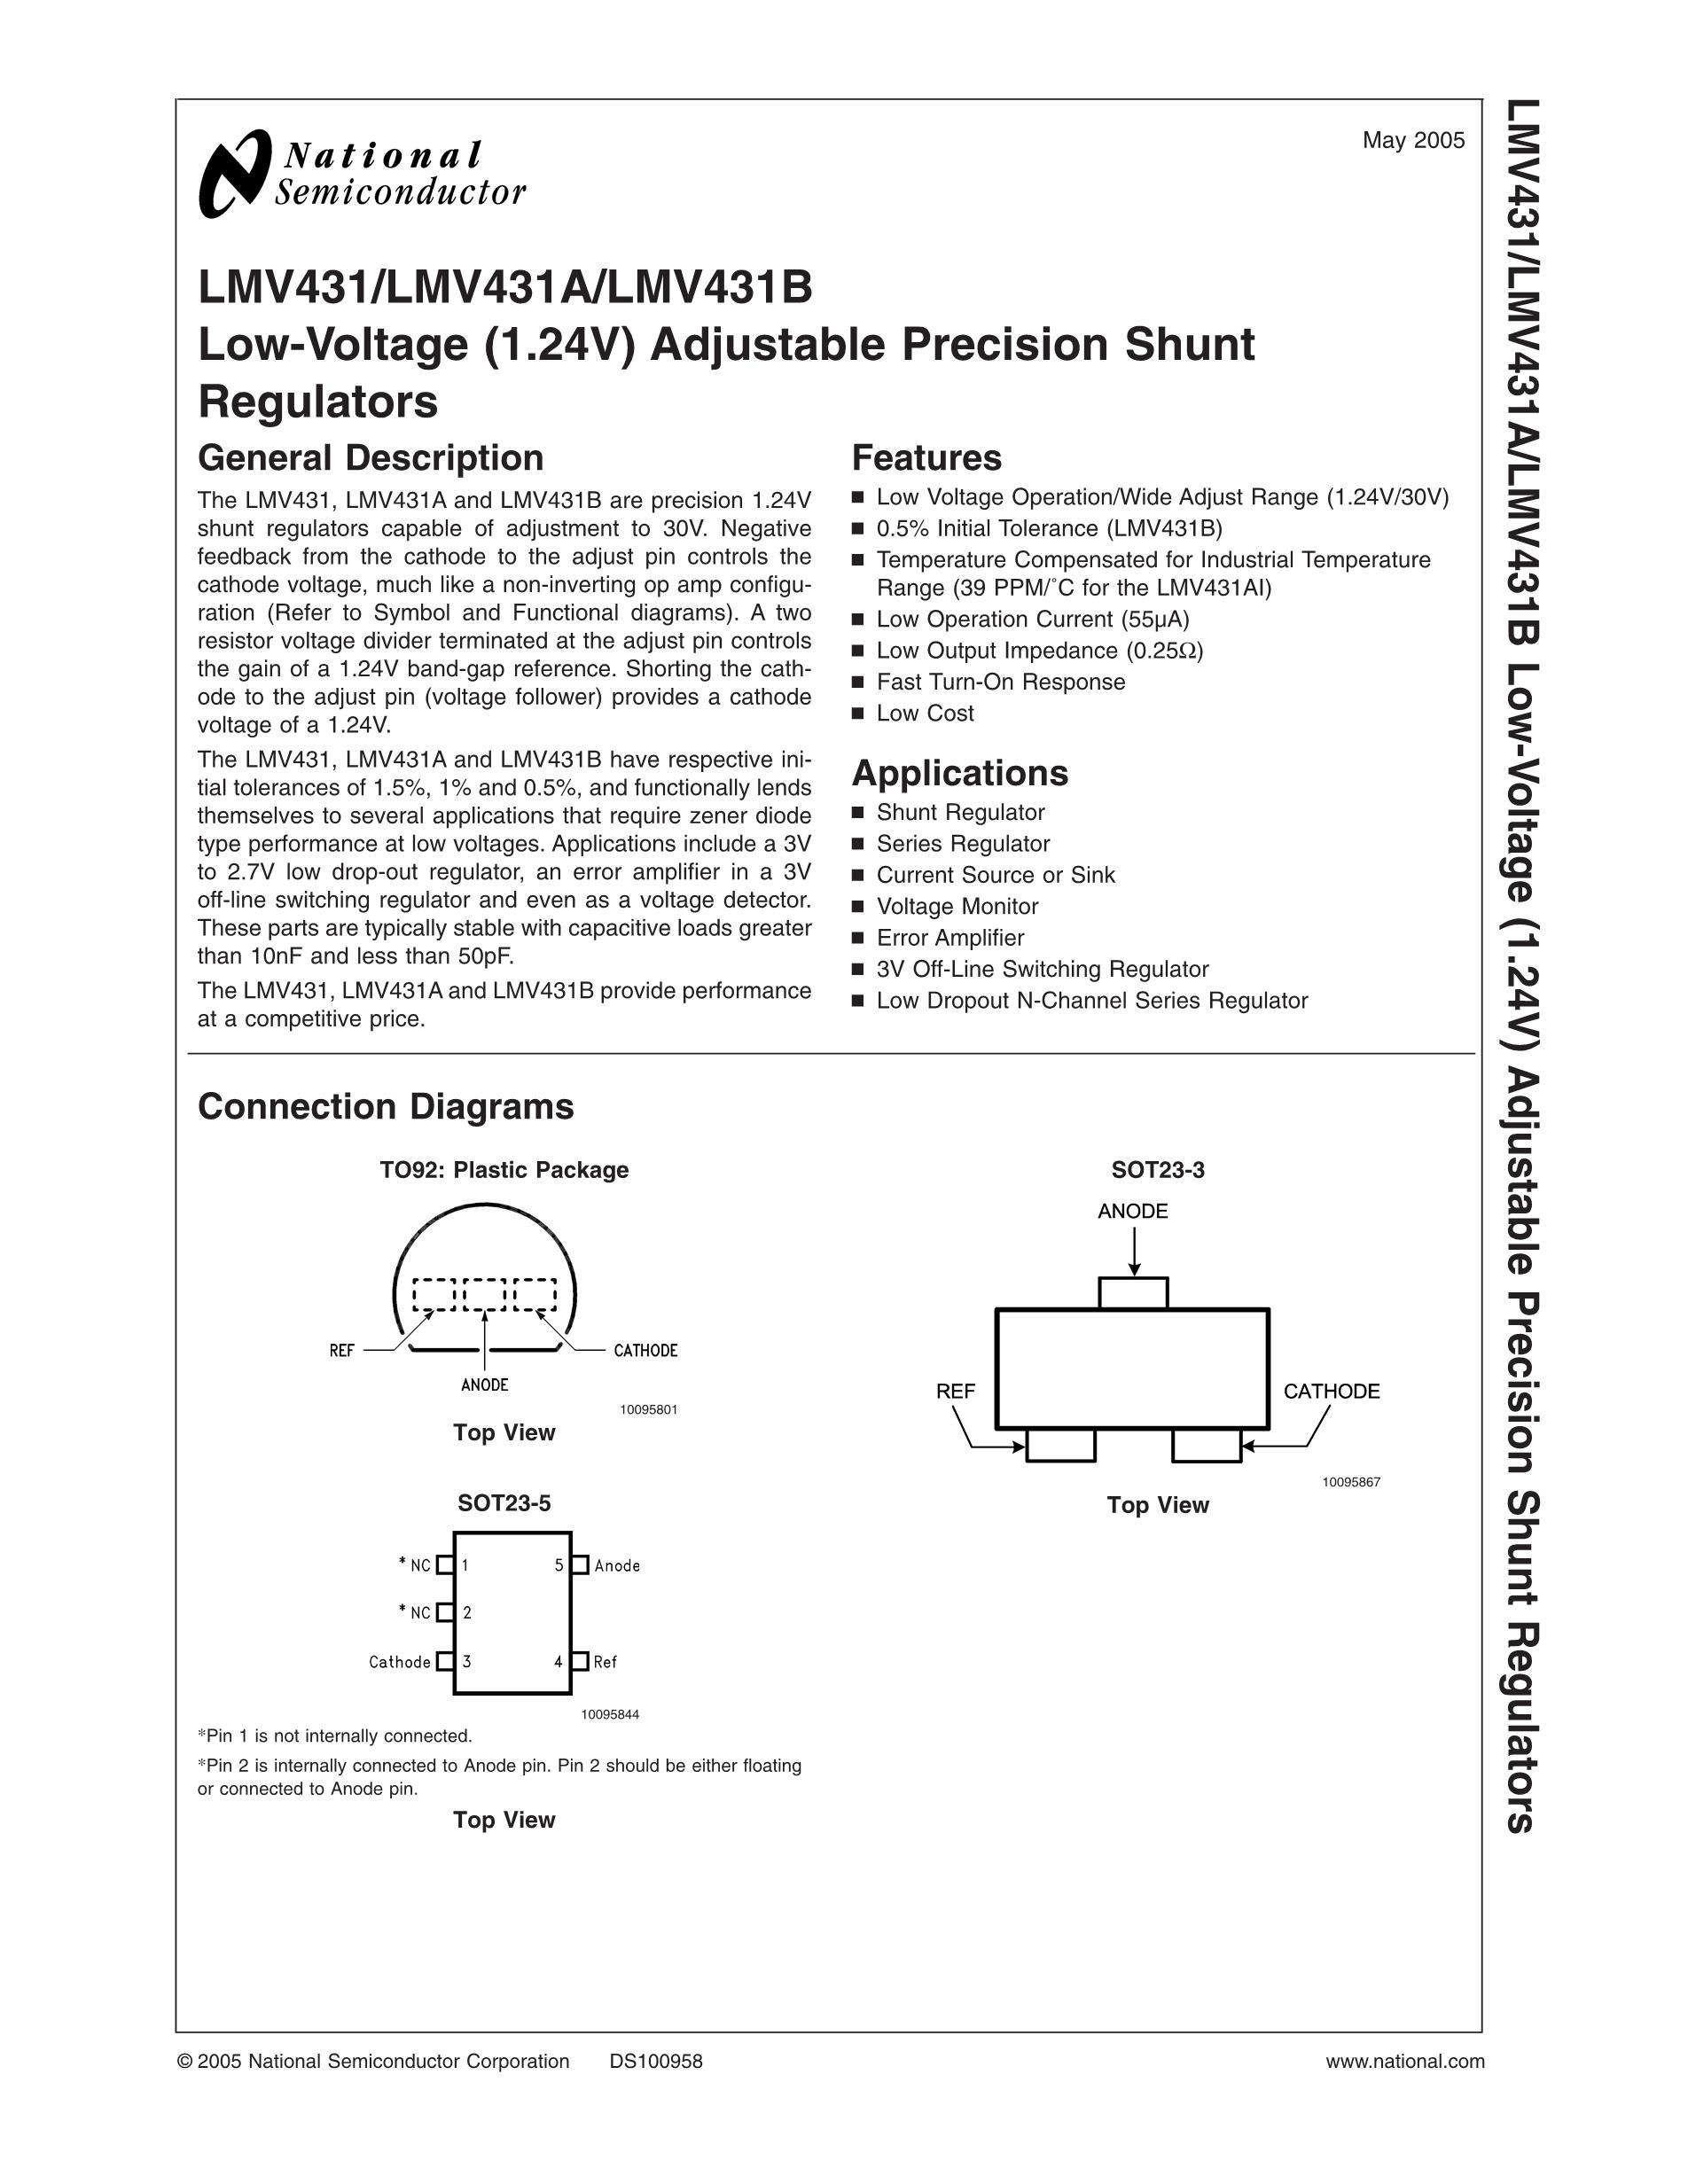 LMV431AIMF NOPB's pdf picture 2